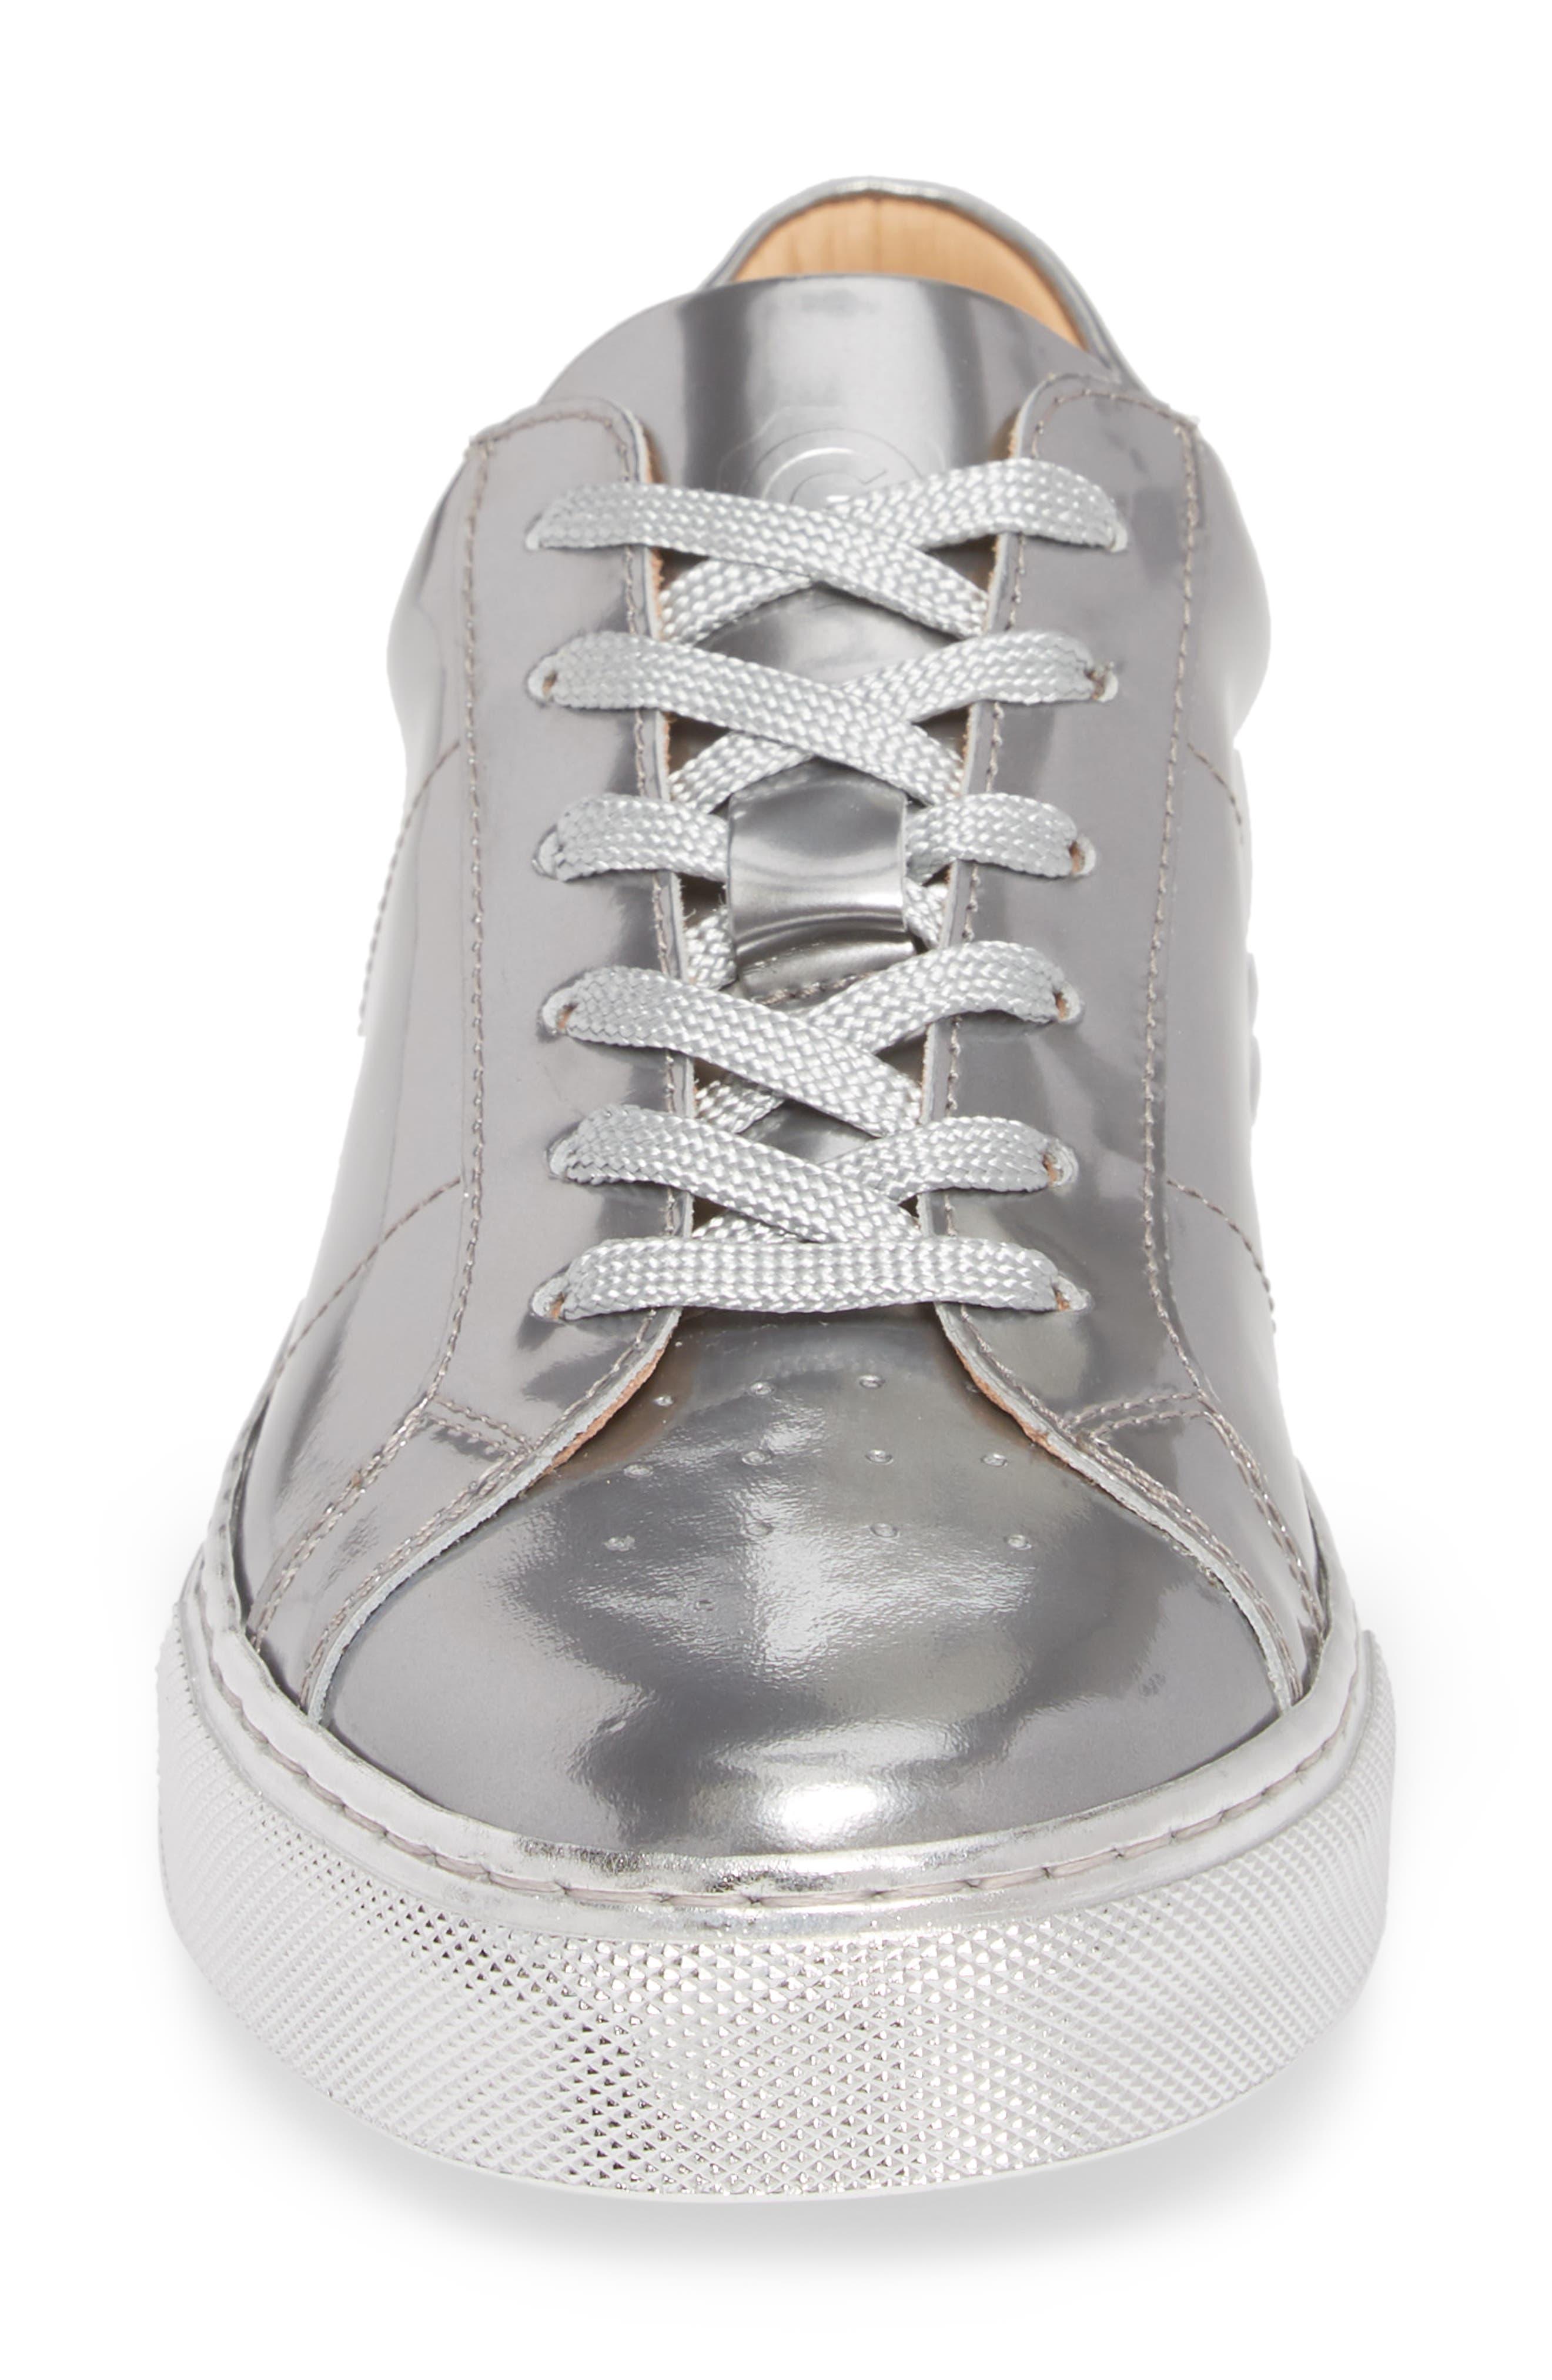 Royale Low Top Sneaker,                             Alternate thumbnail 4, color,                             Silver Tonal/ Flat Leather